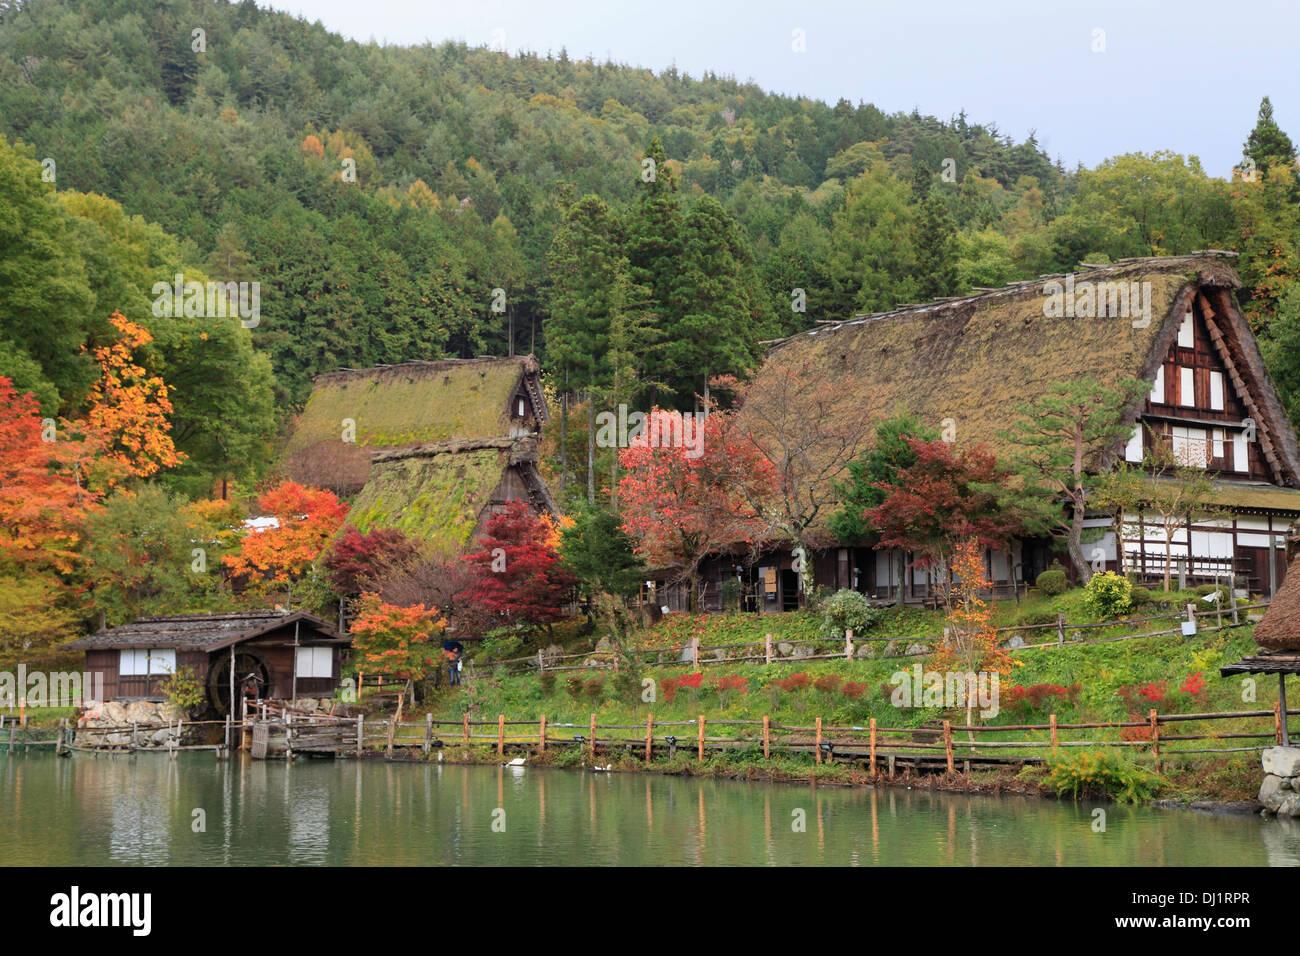 Japan, Hida, Takayama, Hida no Sato, old farmhouses, - Stock Image